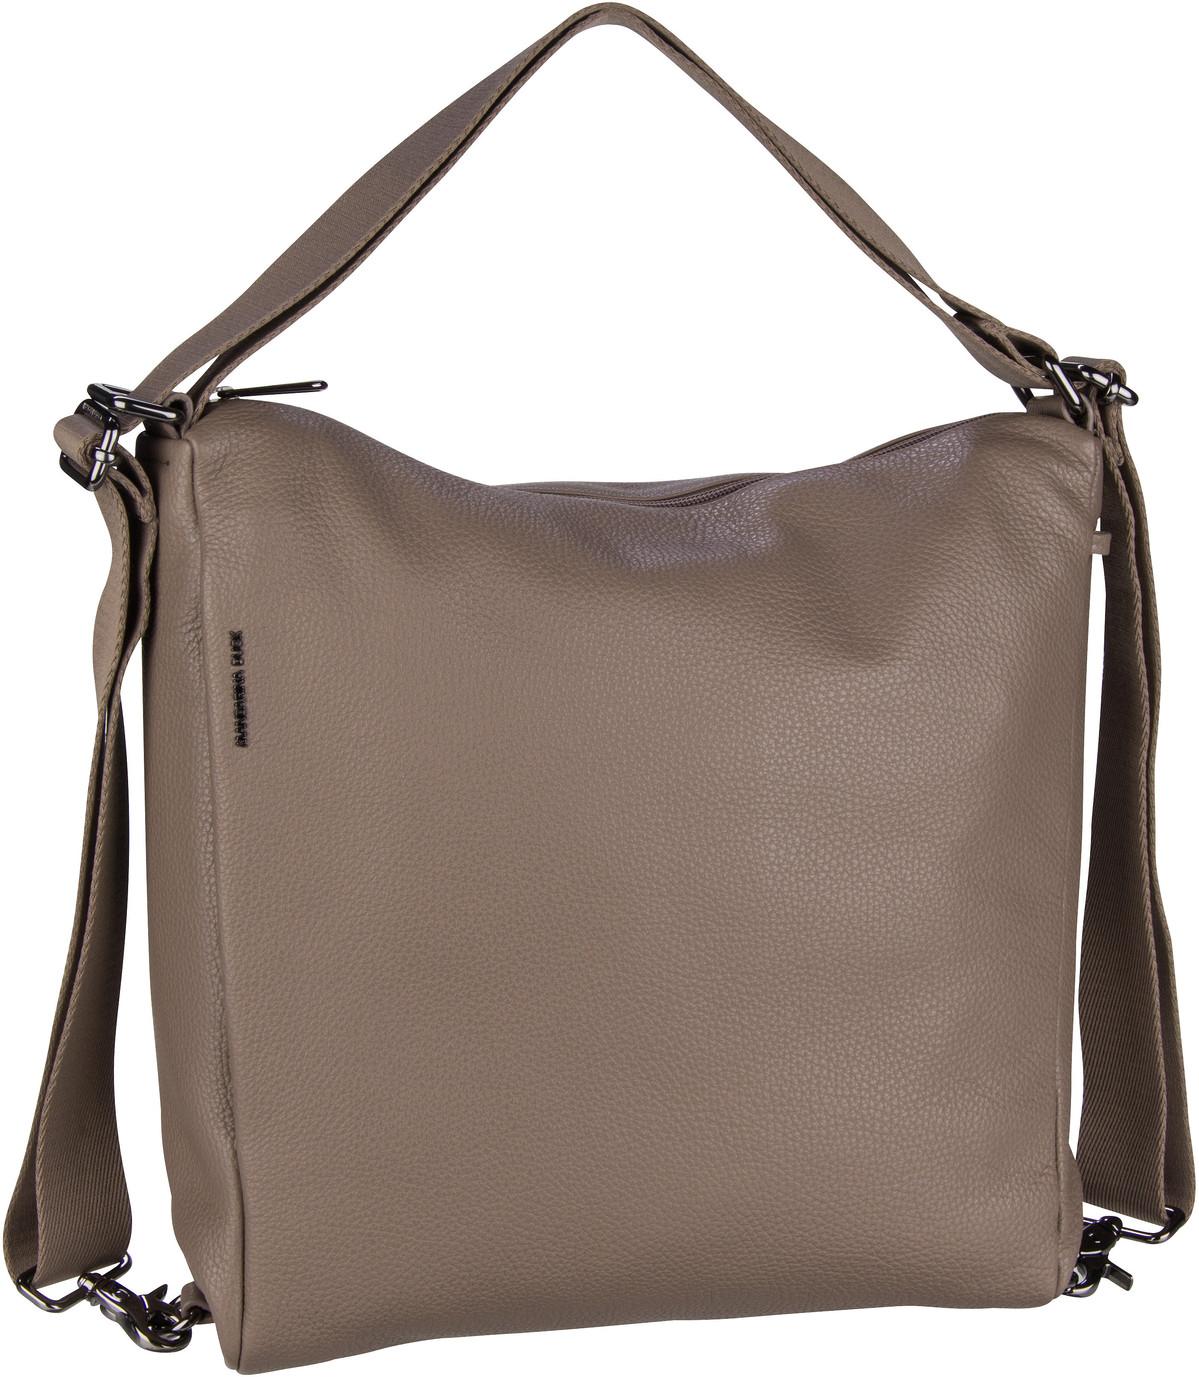 Handtasche Mellow Leather Hobo Backpack FZT72 Amphora